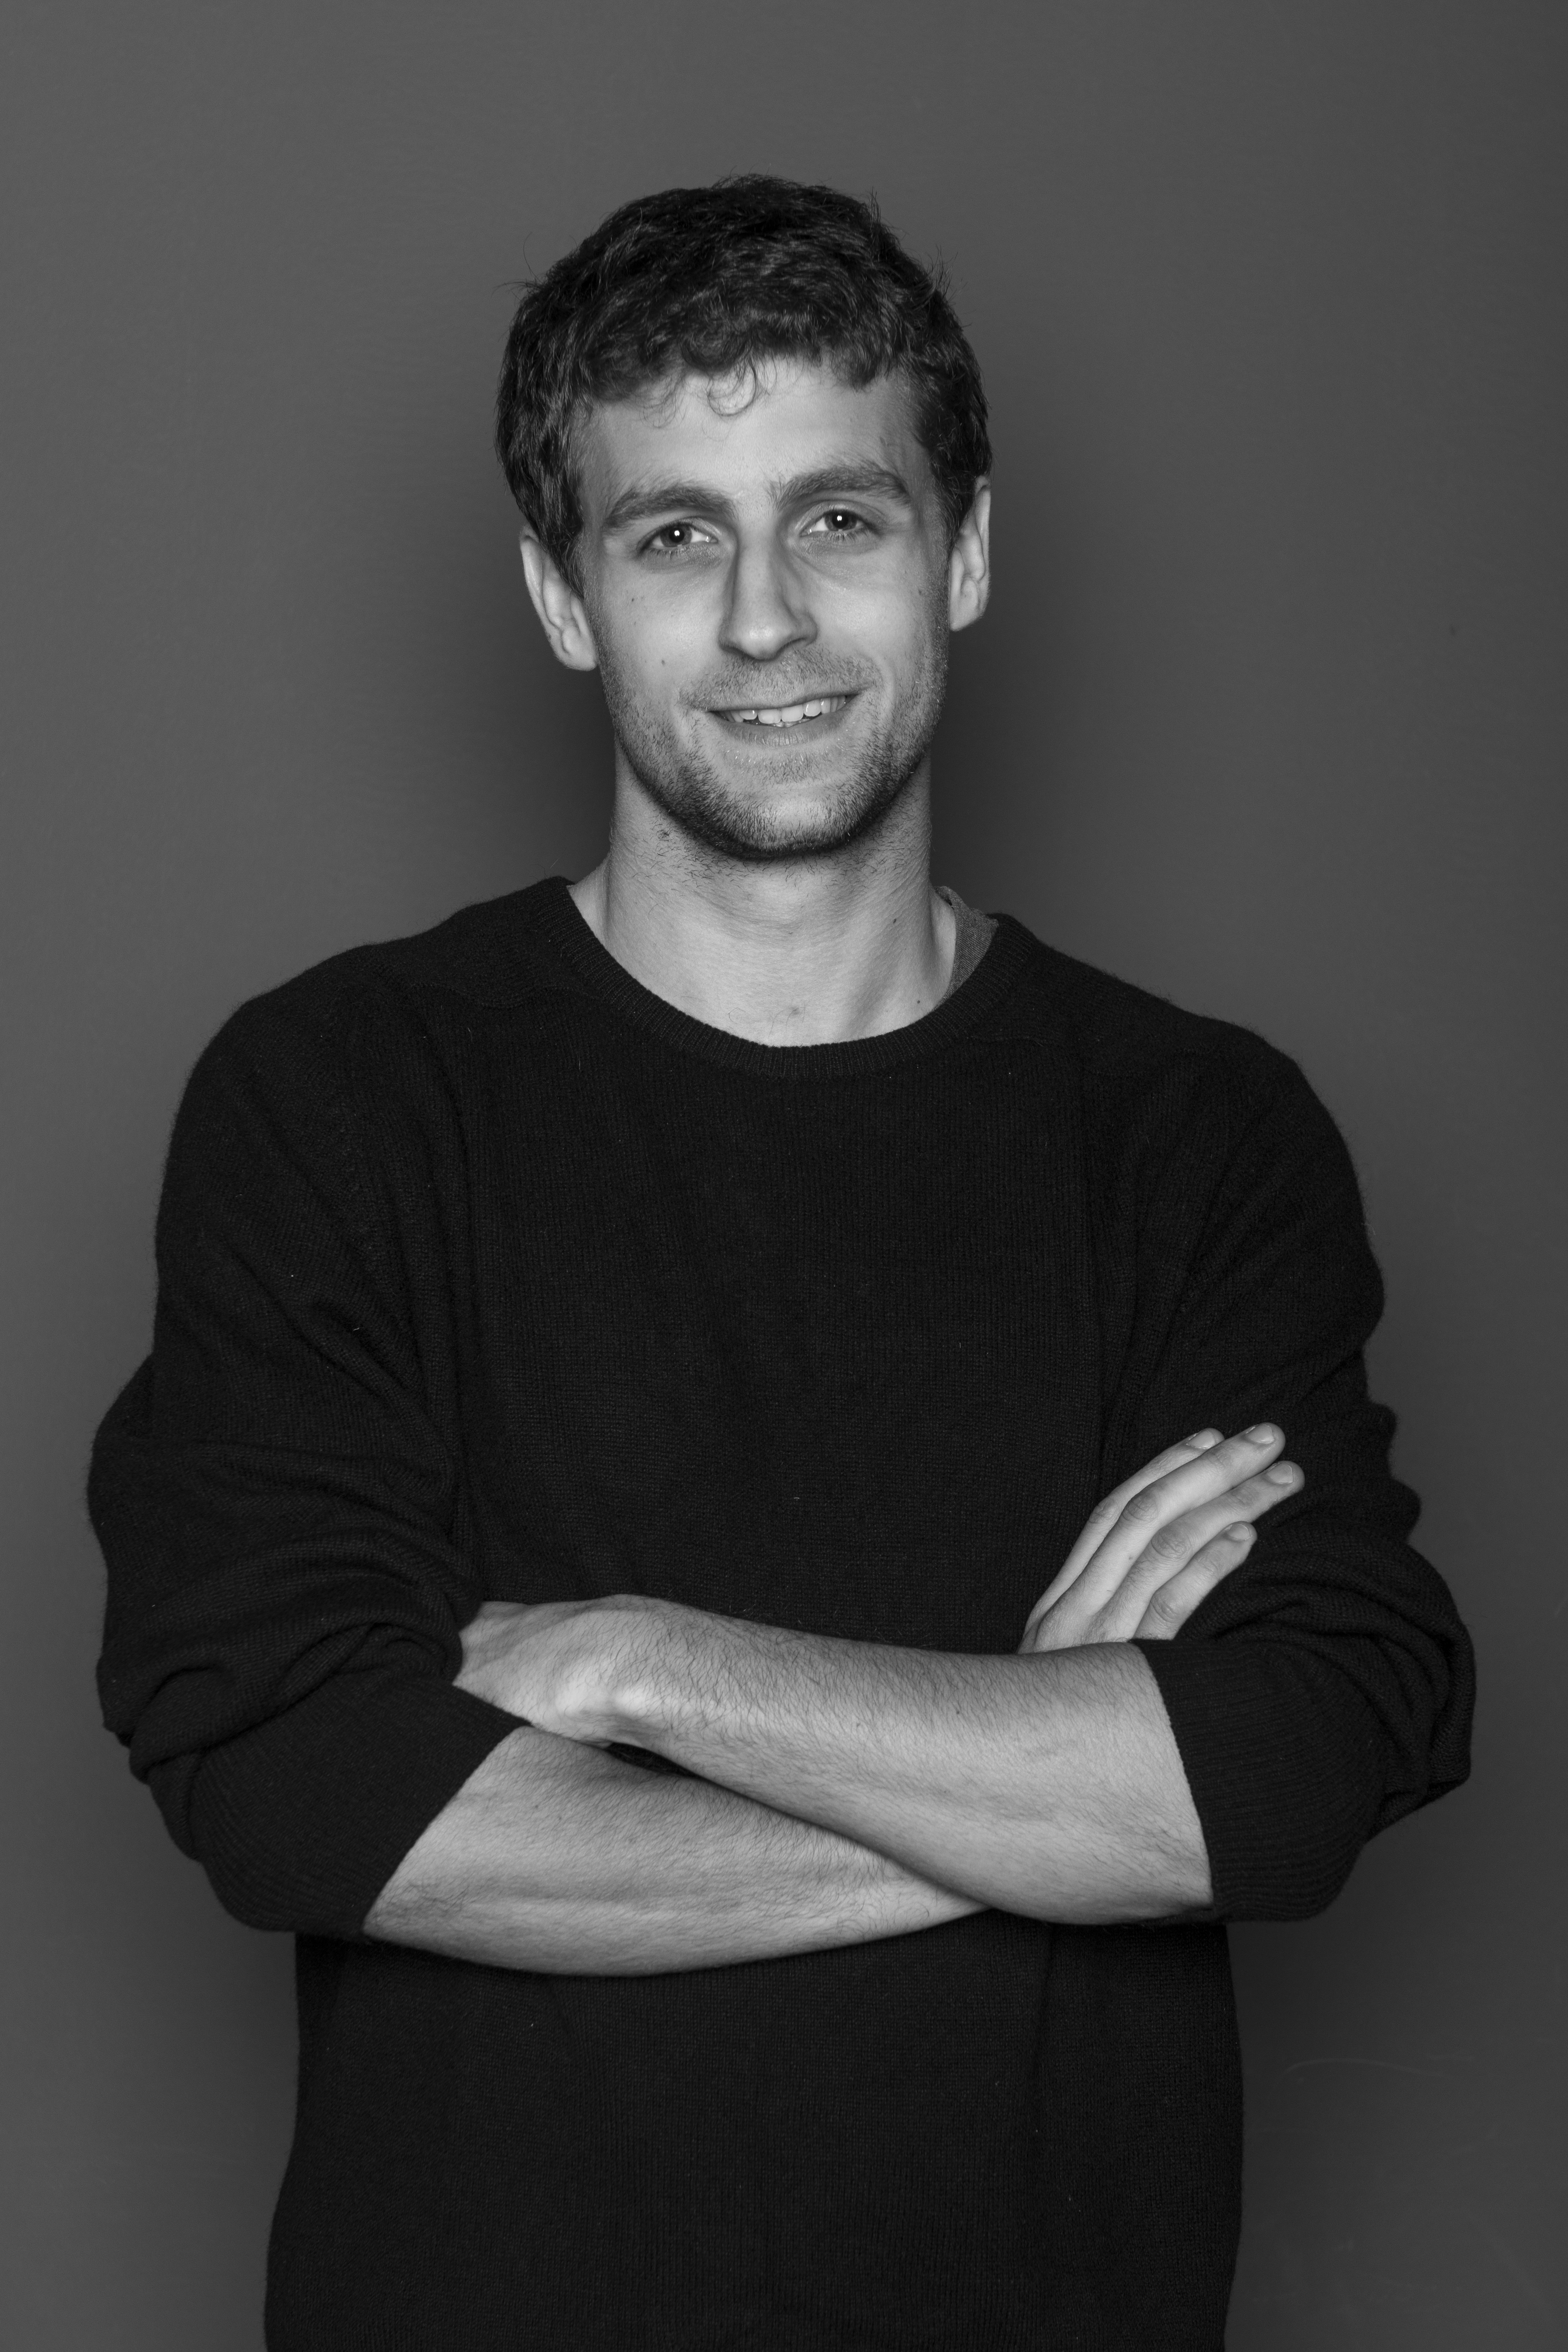 Elliott Covrigaru